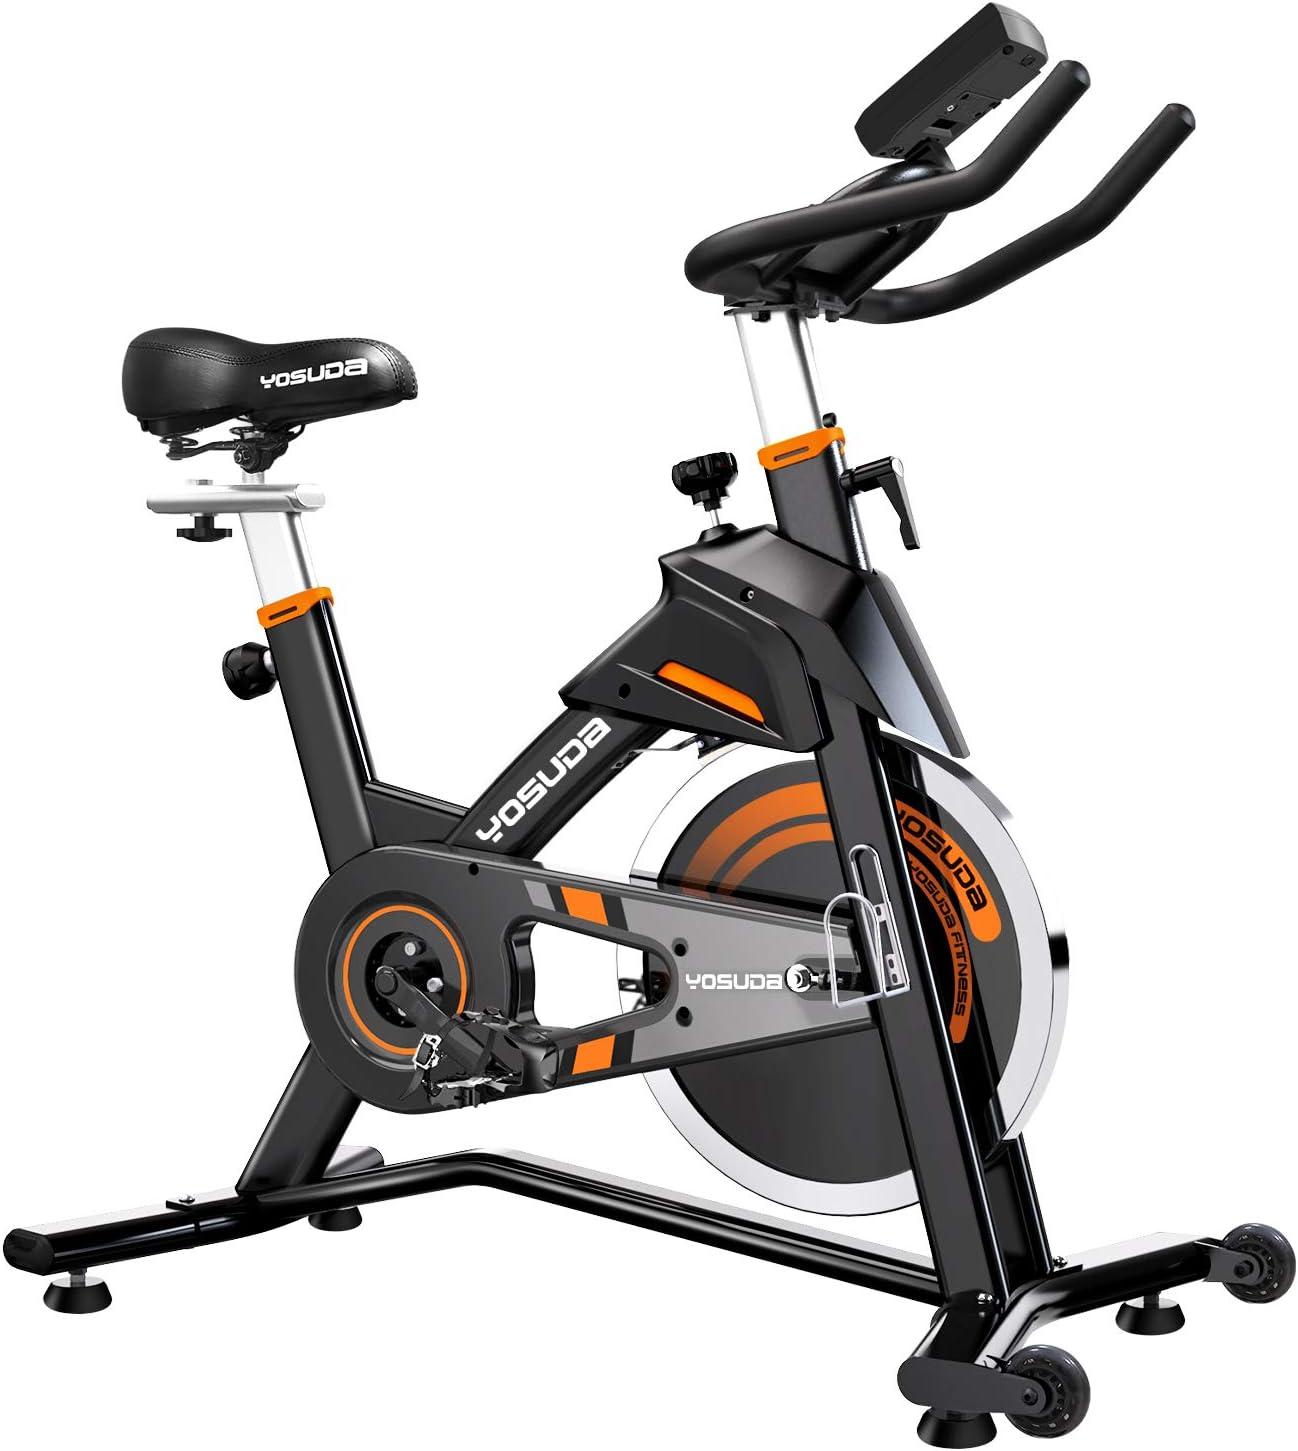 YOSUDA Indoor Exercise Bike Stationary